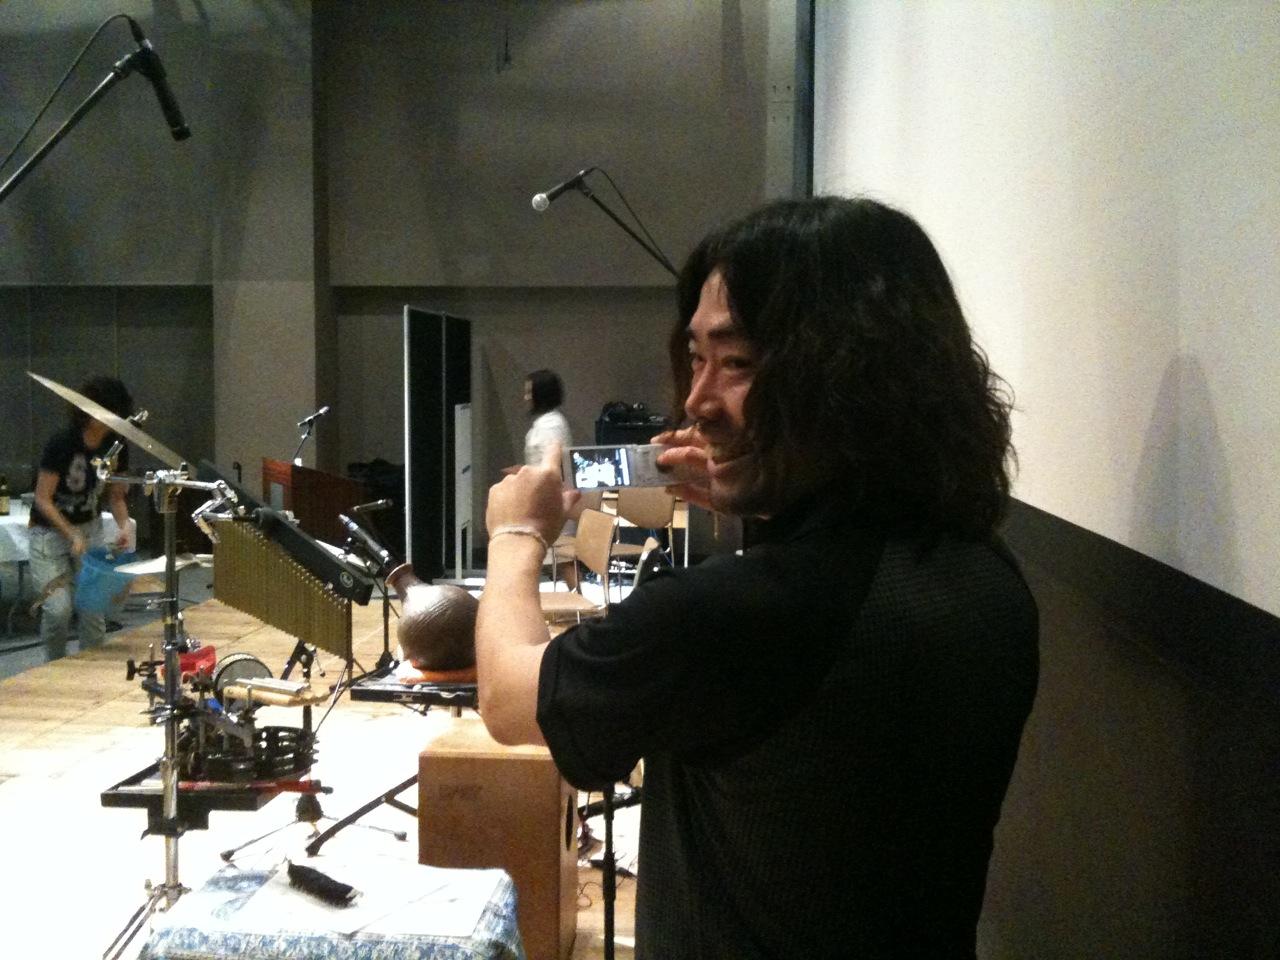 yuuくんと斉藤くんと_f0018889_9441084.jpg